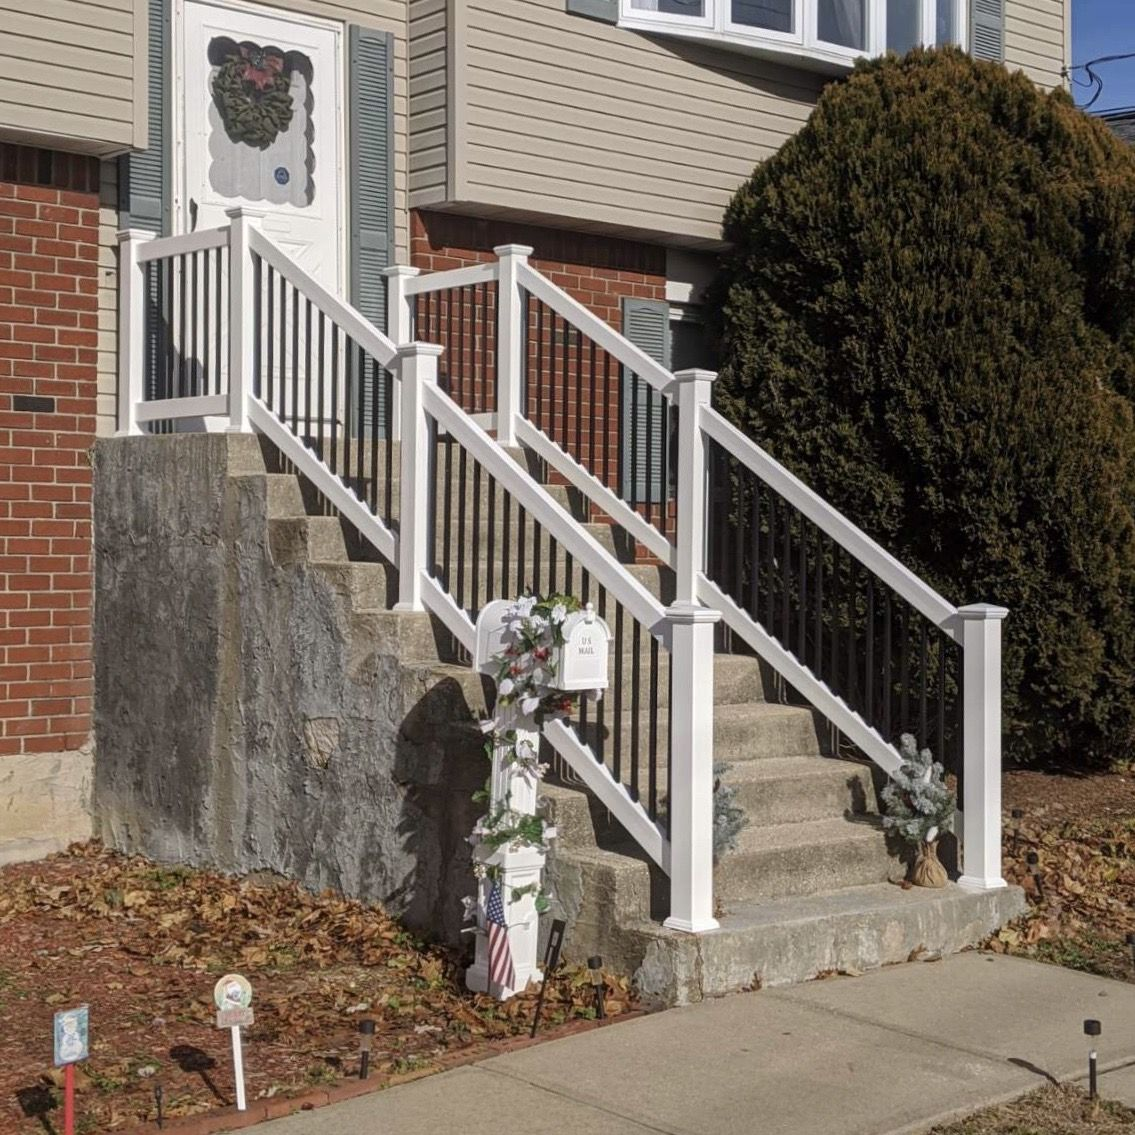 36 White Vinyl Black Aluminum Stair Railings Railings Outdoor | Black Aluminum Stair Railing | Interior | Classic | Simple | Square Metal | Pressure Treated Deck Black